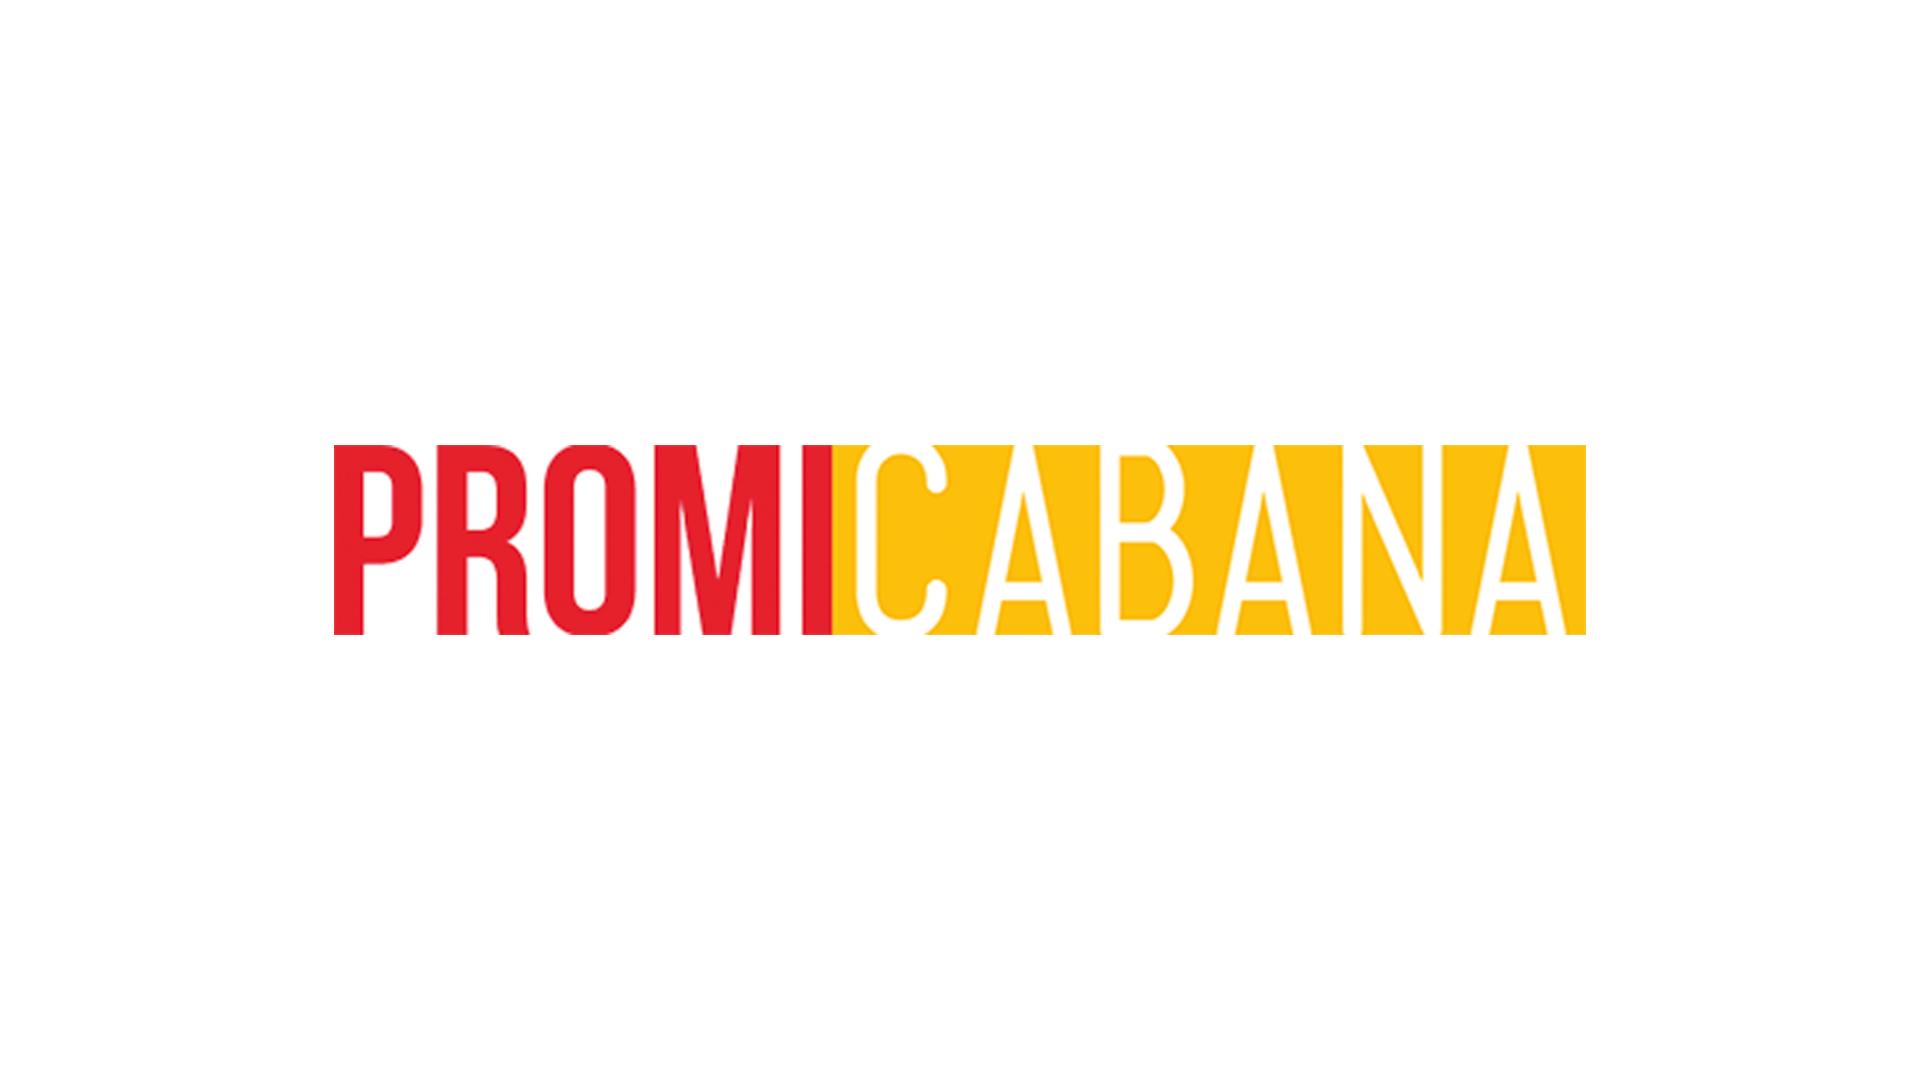 Lady-Gaga-MTV-First-Times-Square-2011